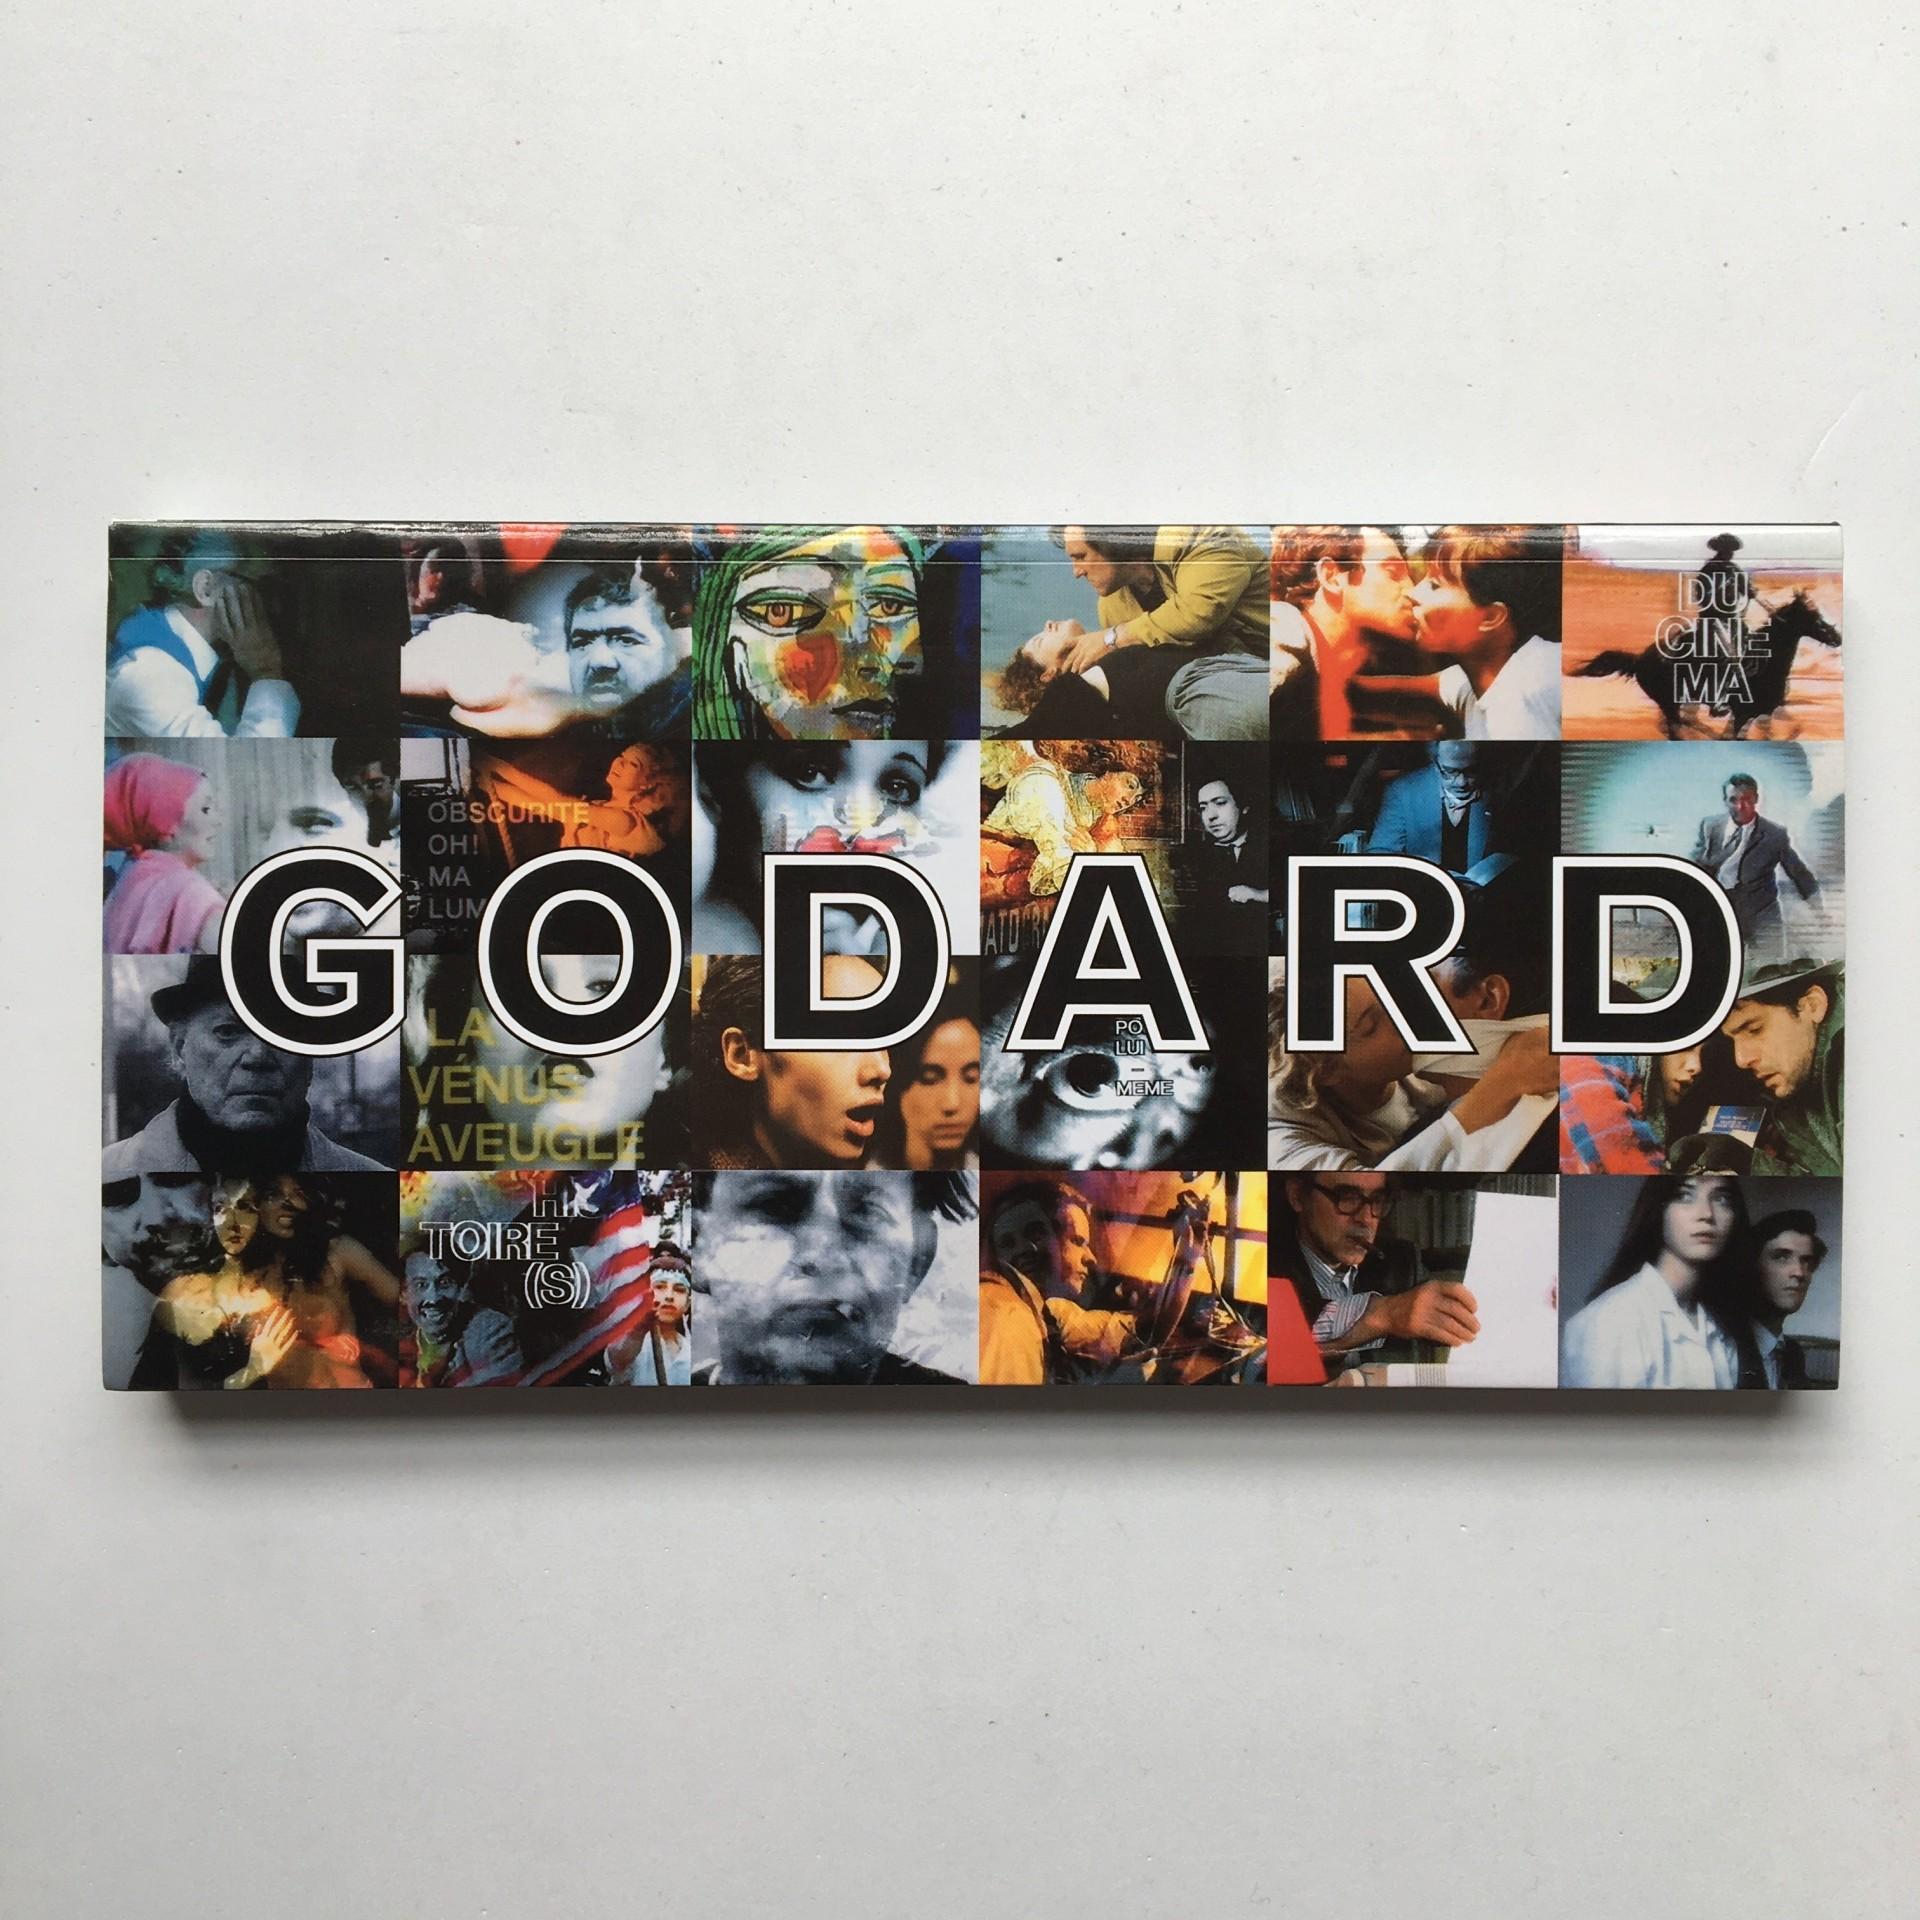 Jean-Luc Godard 1985-1999